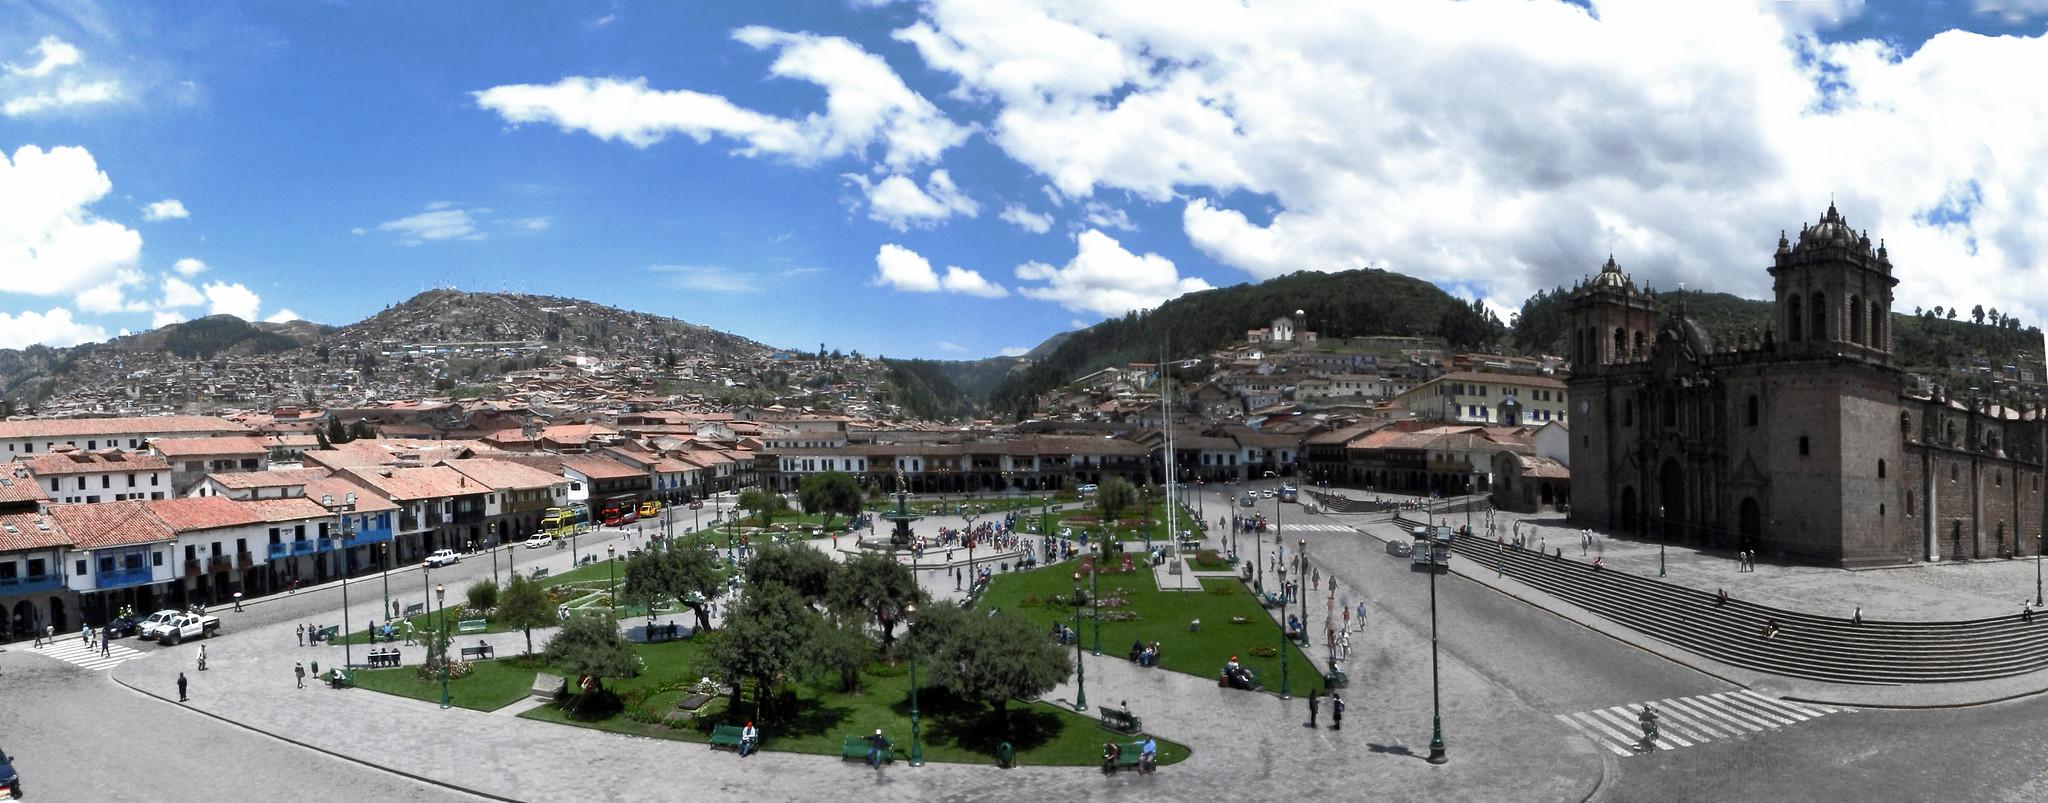 Cuzco Plaza de Armas Peru